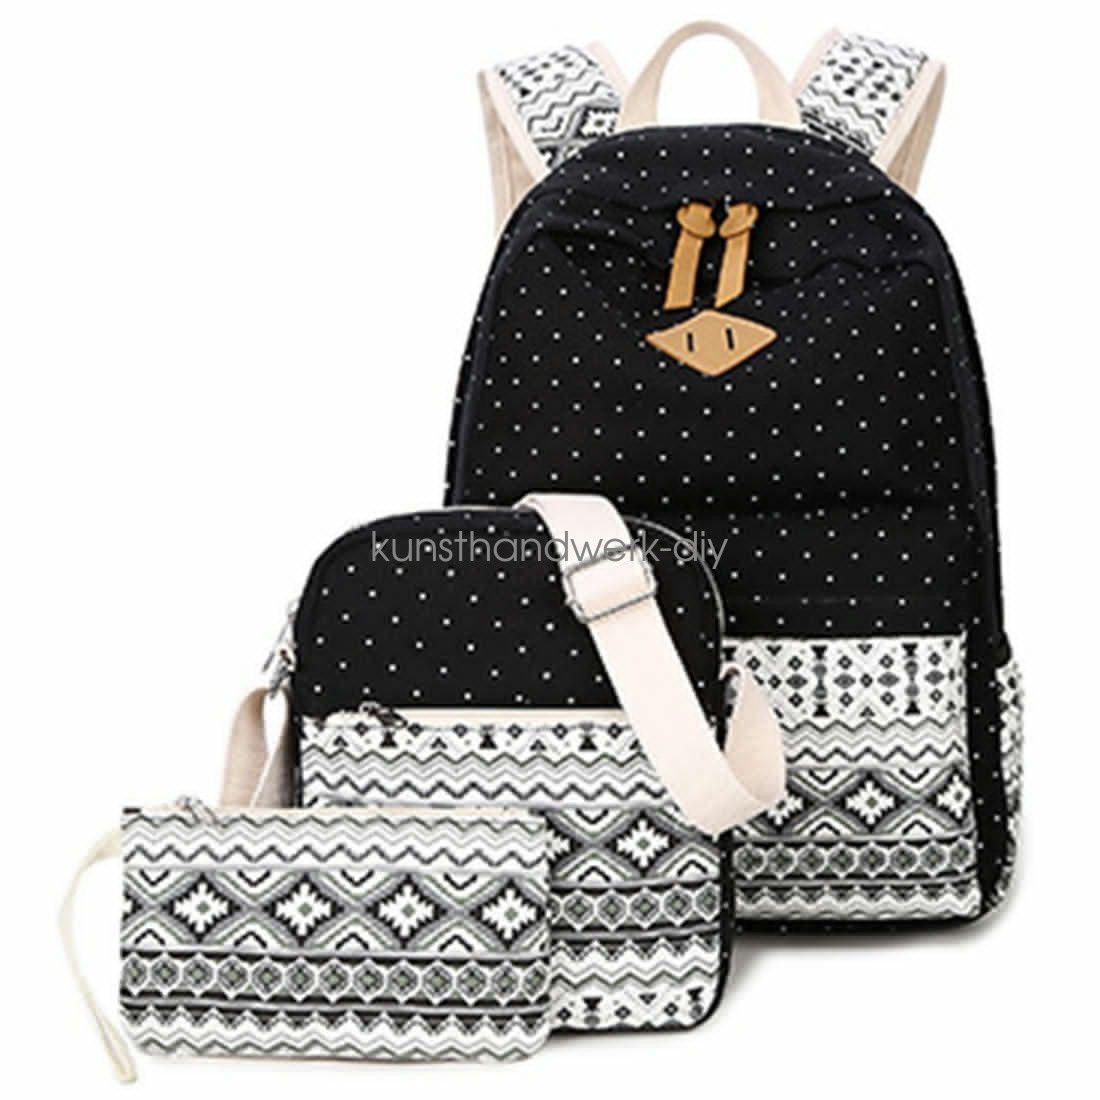 6dfcdc62d723 3Pcs Set Backpack Women Canvas Travel Bookbags School Bags For Teenage Girls  Kus